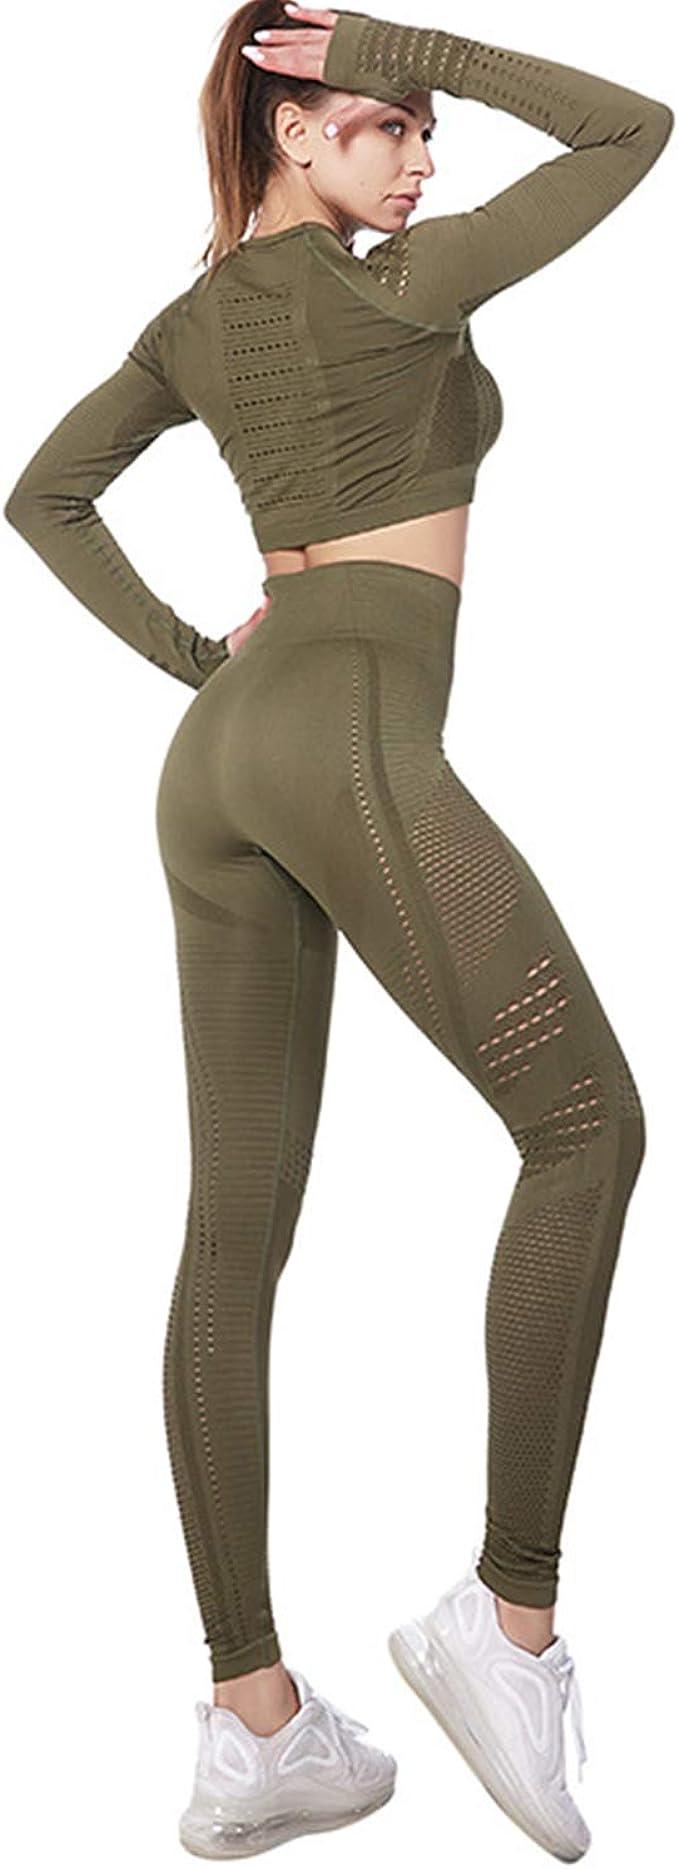 BOTRE Damen Traingsanzug Yoga Kleidung Anzug 5er-Set Sportanz/üge Jogginganzug Gym Fitness Kleidung Laufbekleidung Sportswear Sport Yoga Outfit Damen BH Leggings Set